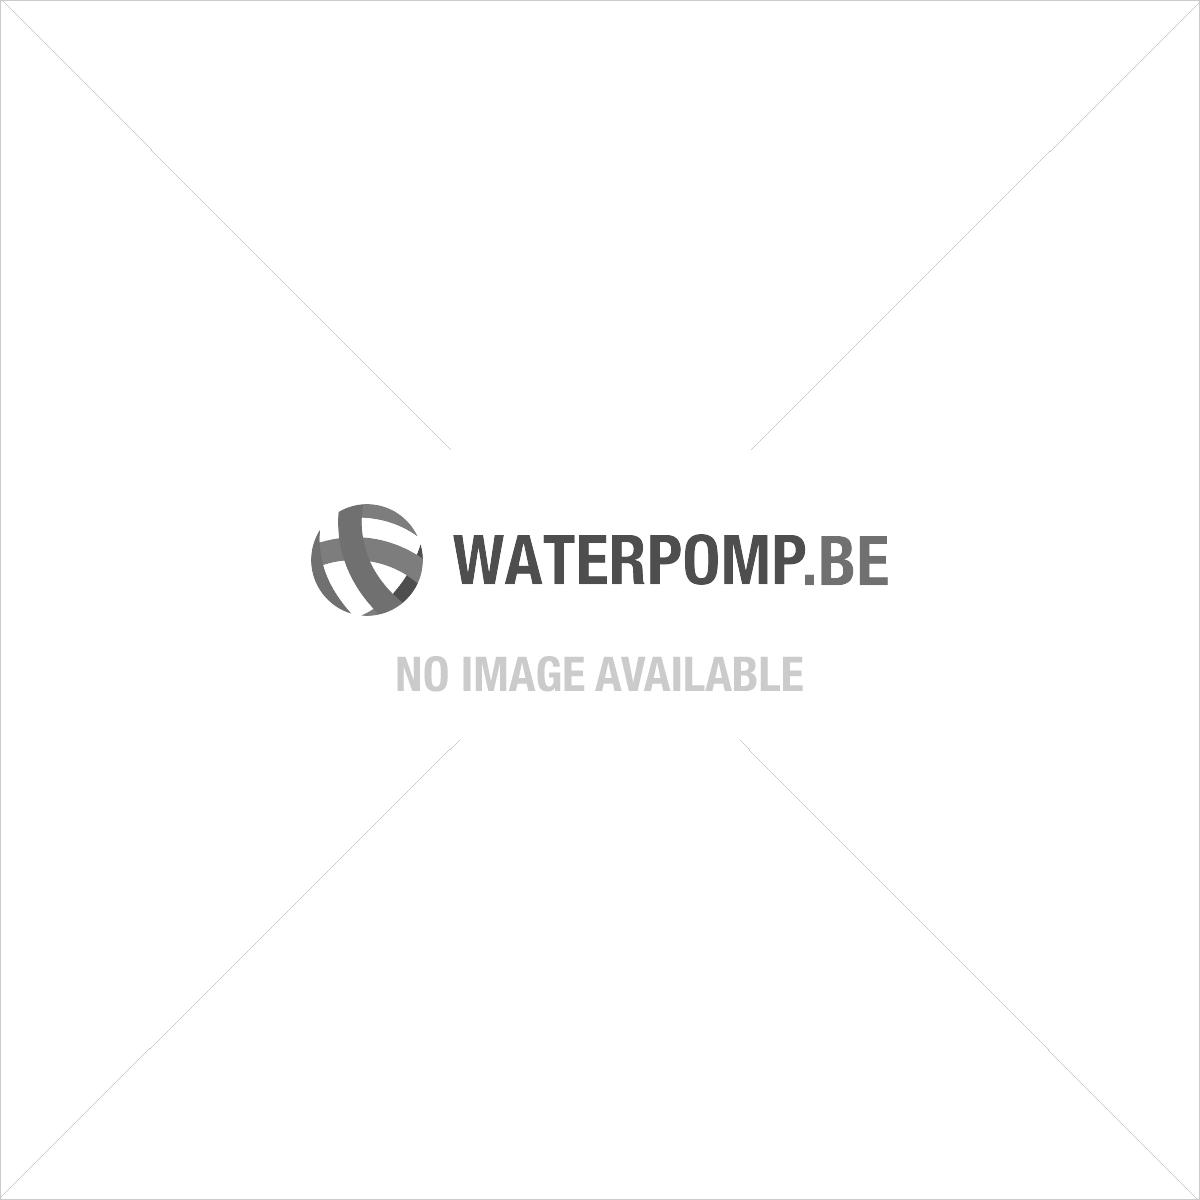 "PE Klemkoppeling 16 mm - 1/2"" (buitendraads)"